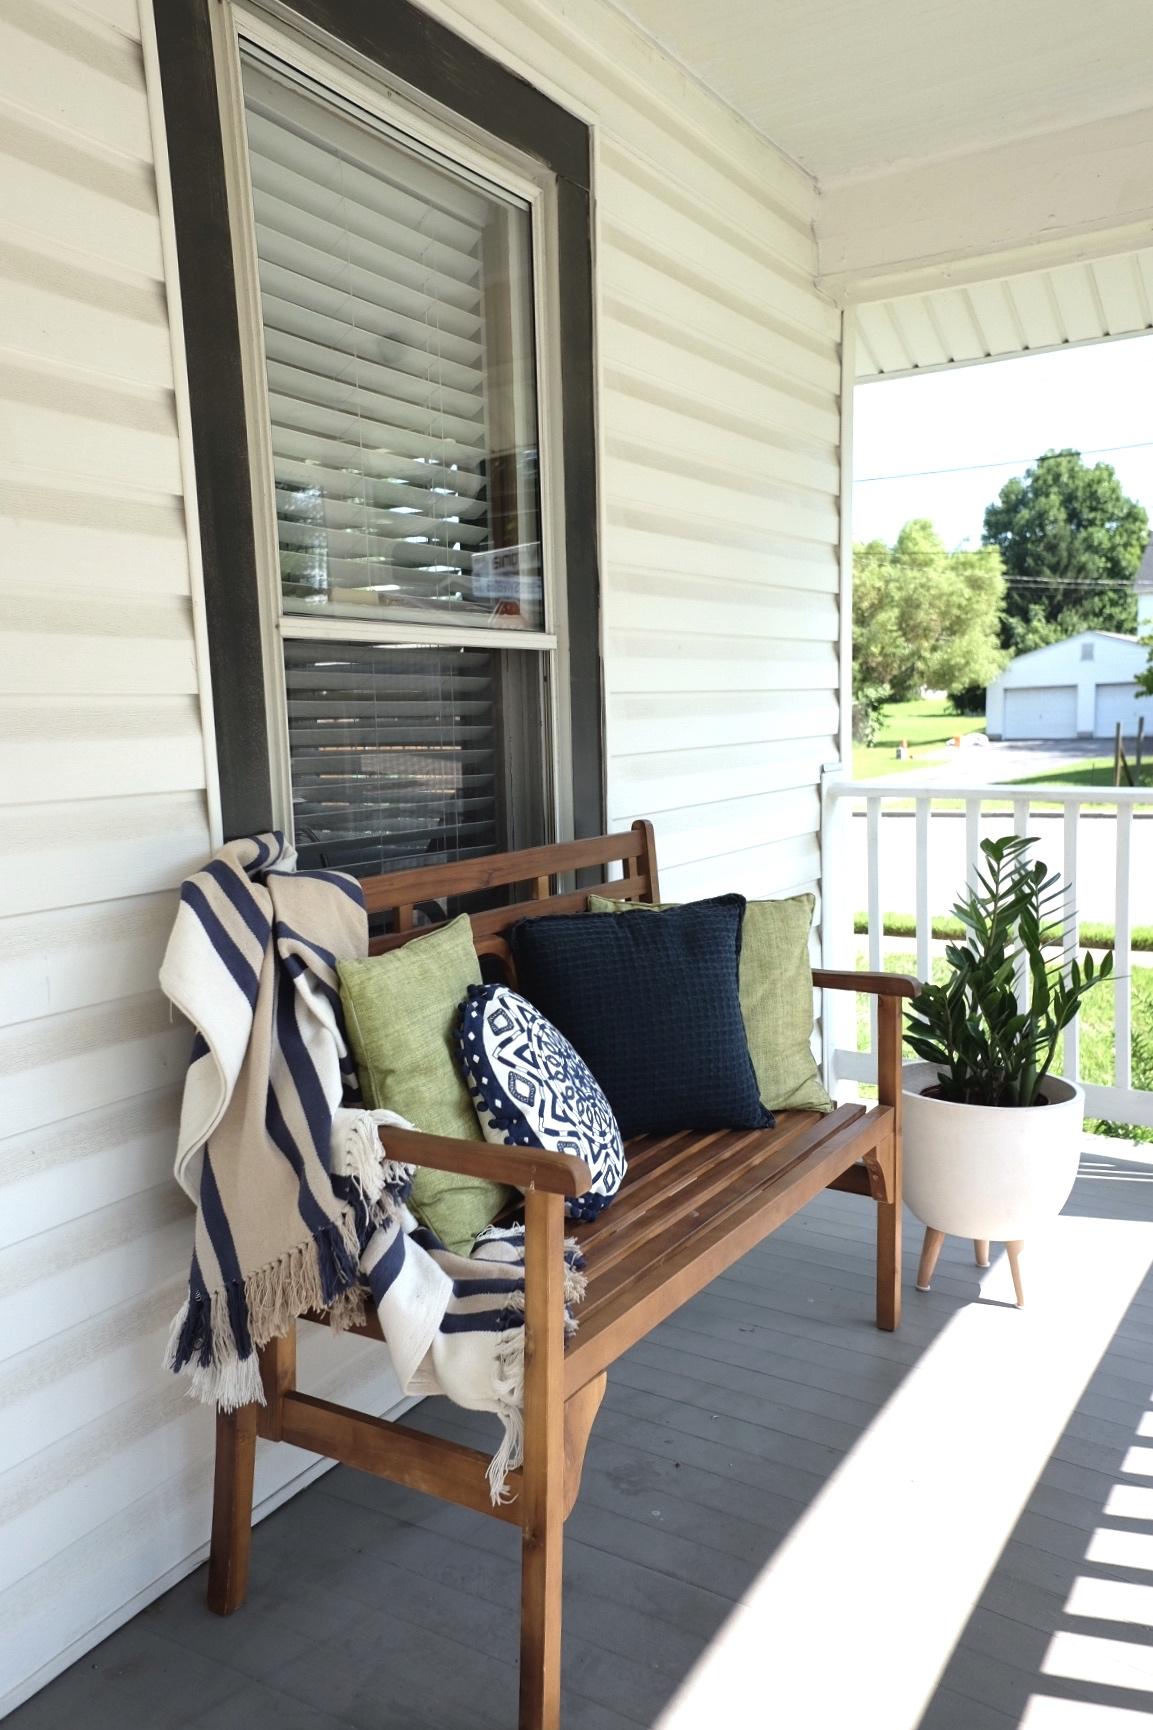 Front Porch at Our Midtown Bungalow Airbnb -   Cottagestyleblog.com